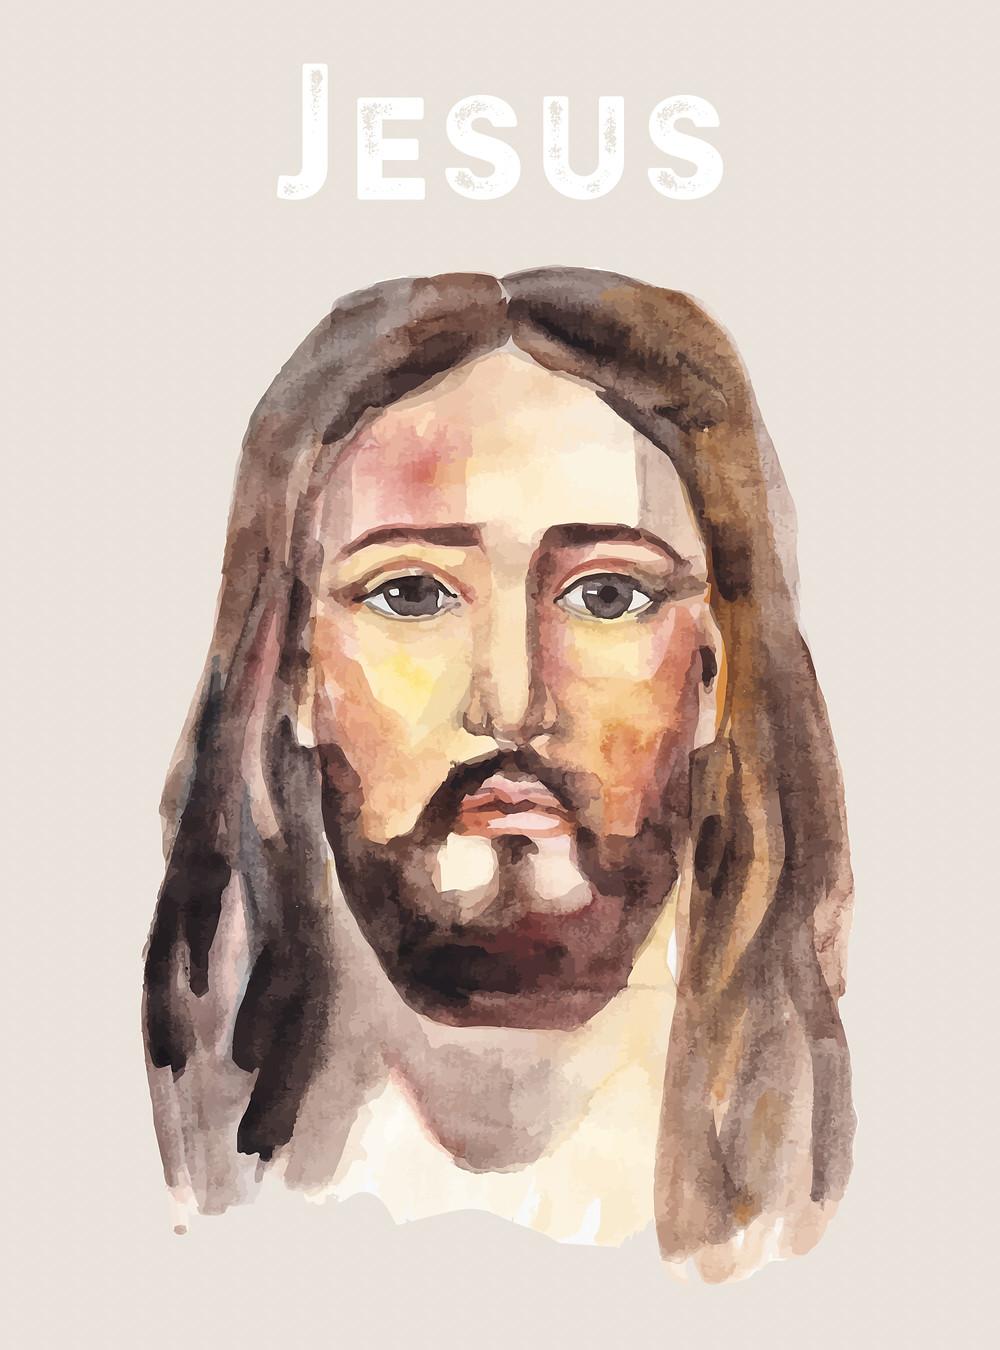 Worship, love, Christ